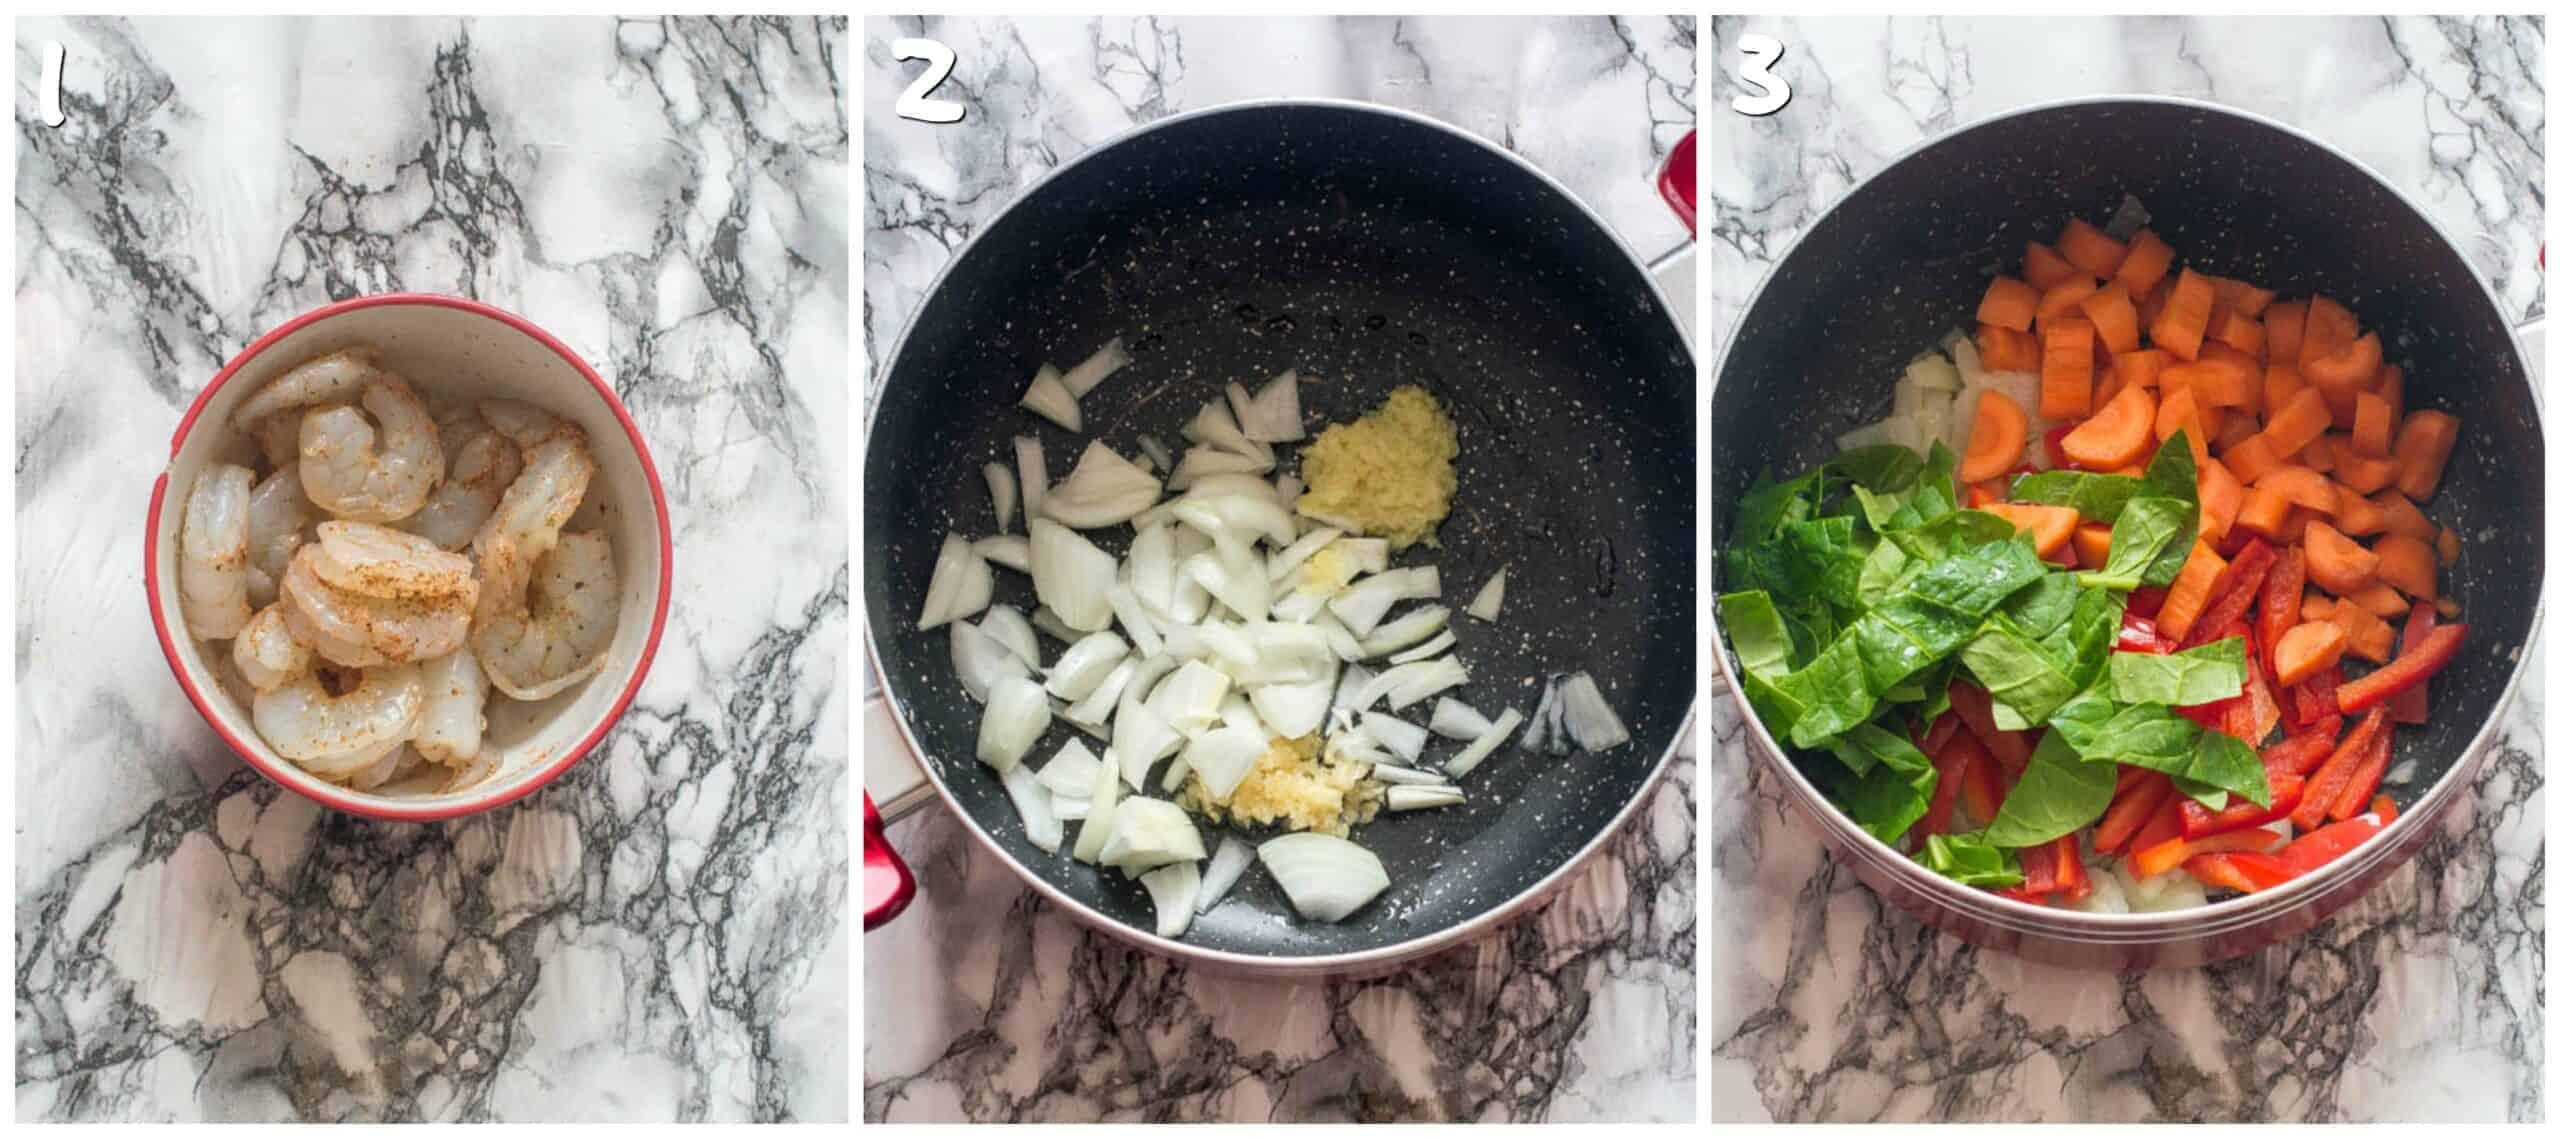 steps 1-3 marinating prawns and sauteing veg